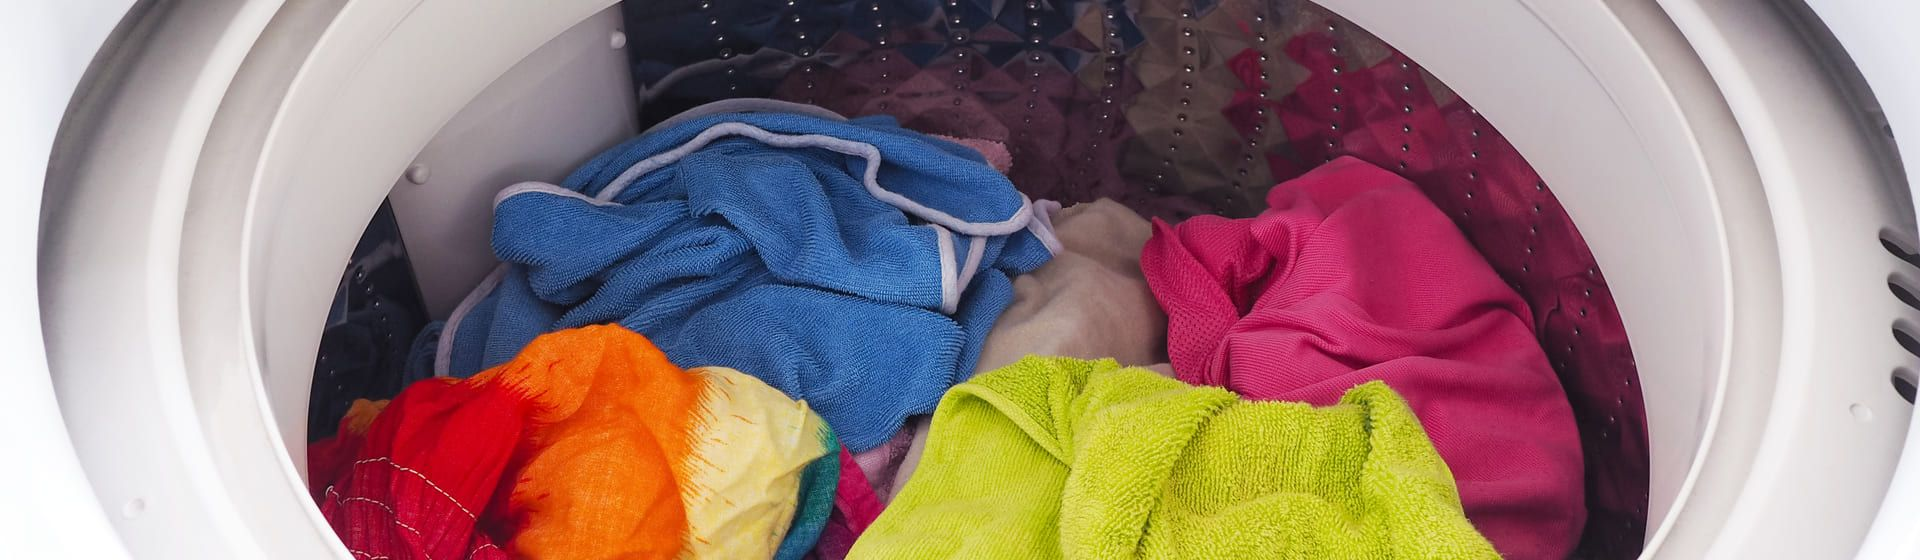 Máquina de lavar Brastemp de 15kg BWH15AB é boa? Confira a análise de ficha técnica